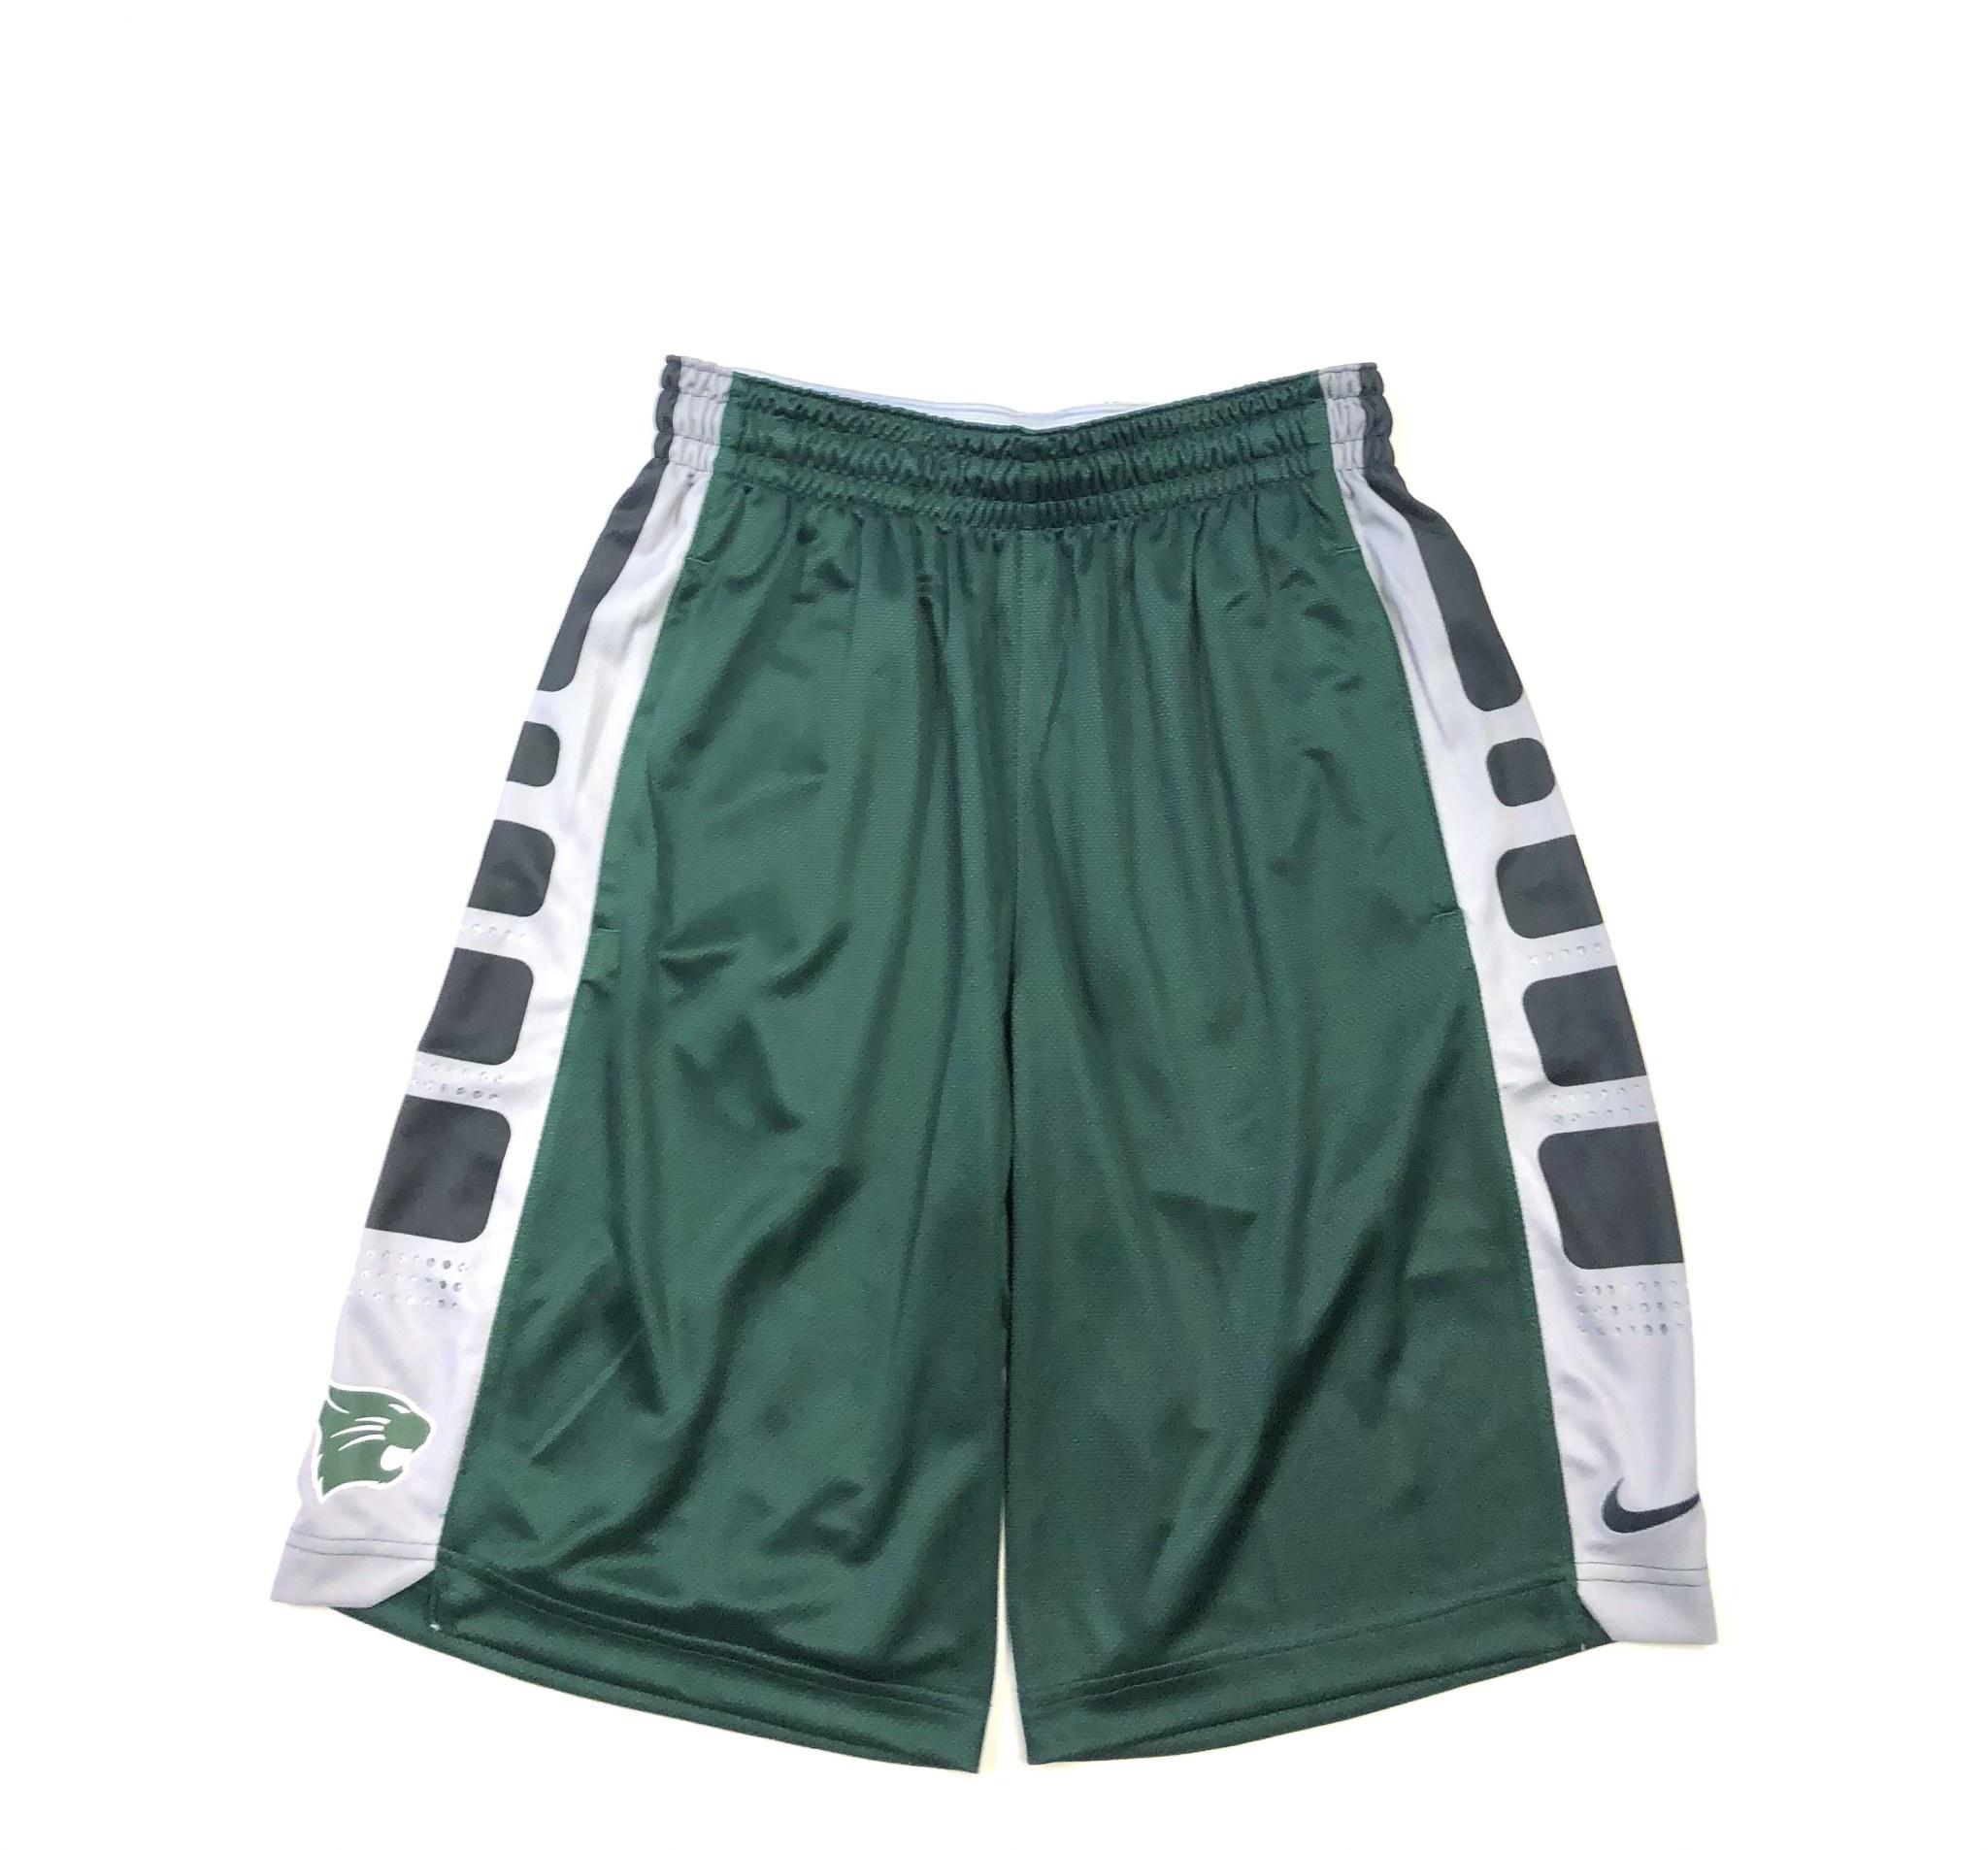 Nike Shorts: Nike XL Elite - Green/Gray Squares Down Side